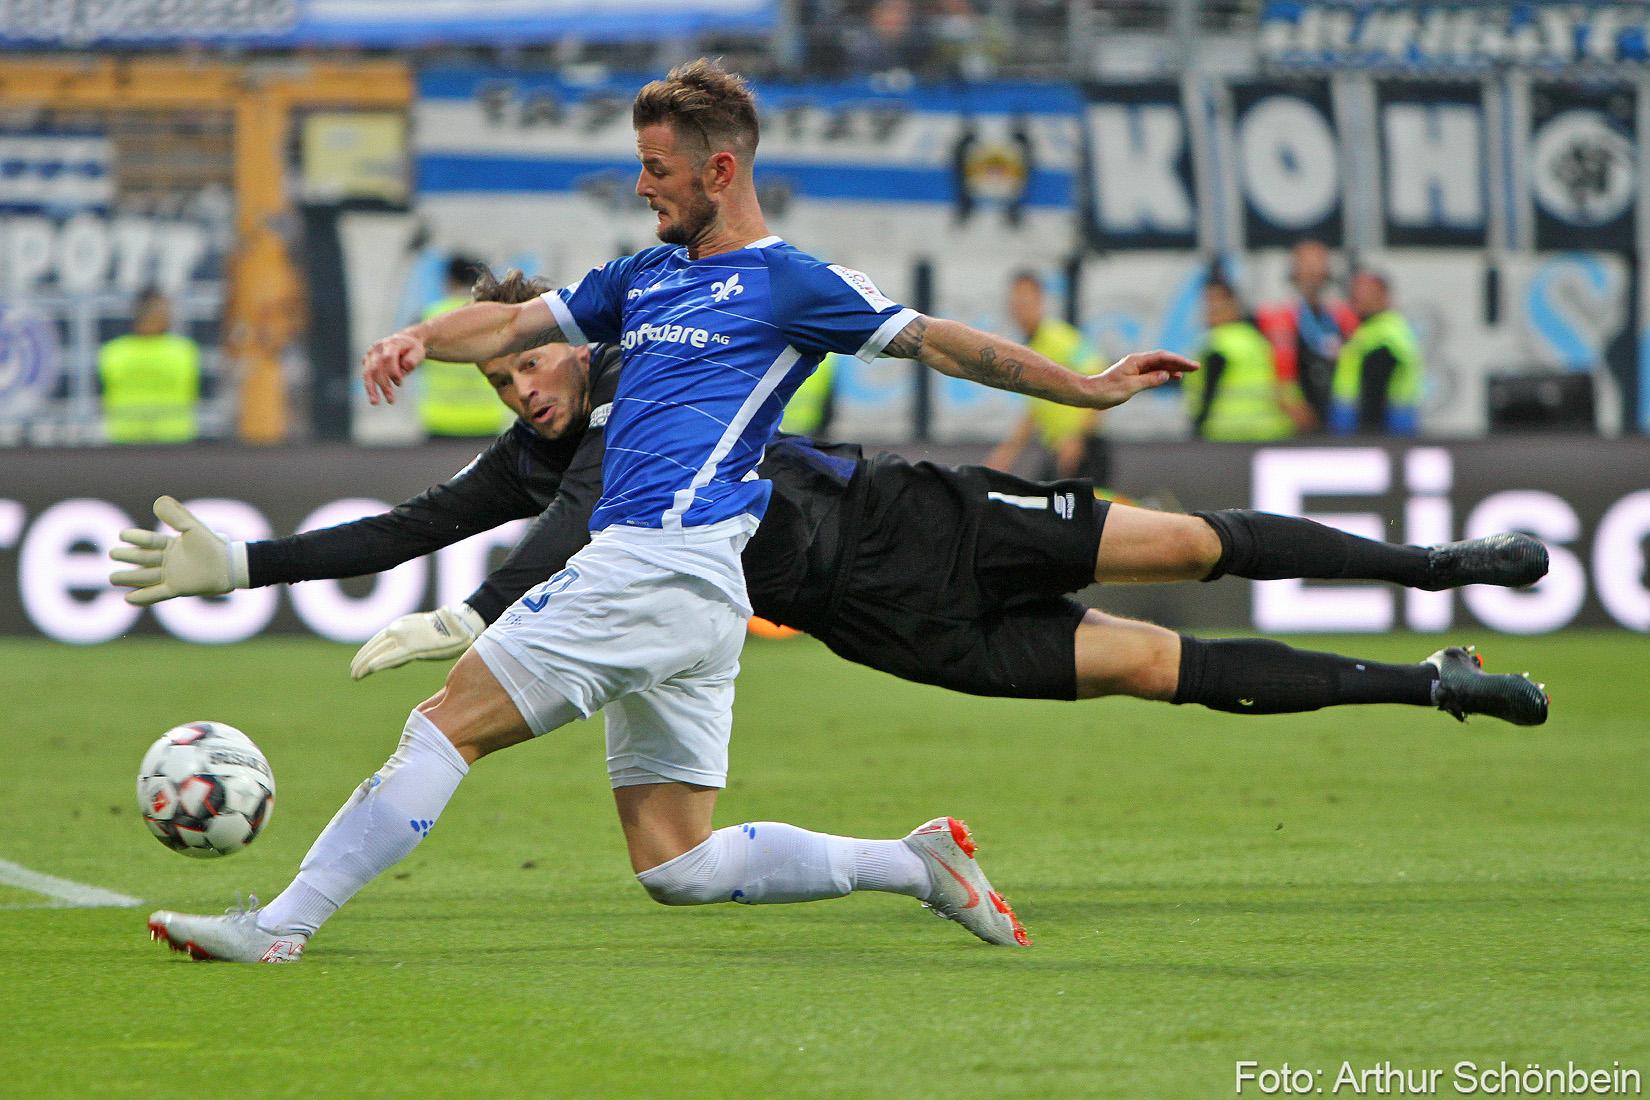 SV Darmstadt 98 – MSV Duisburg 3:0 (0:0)